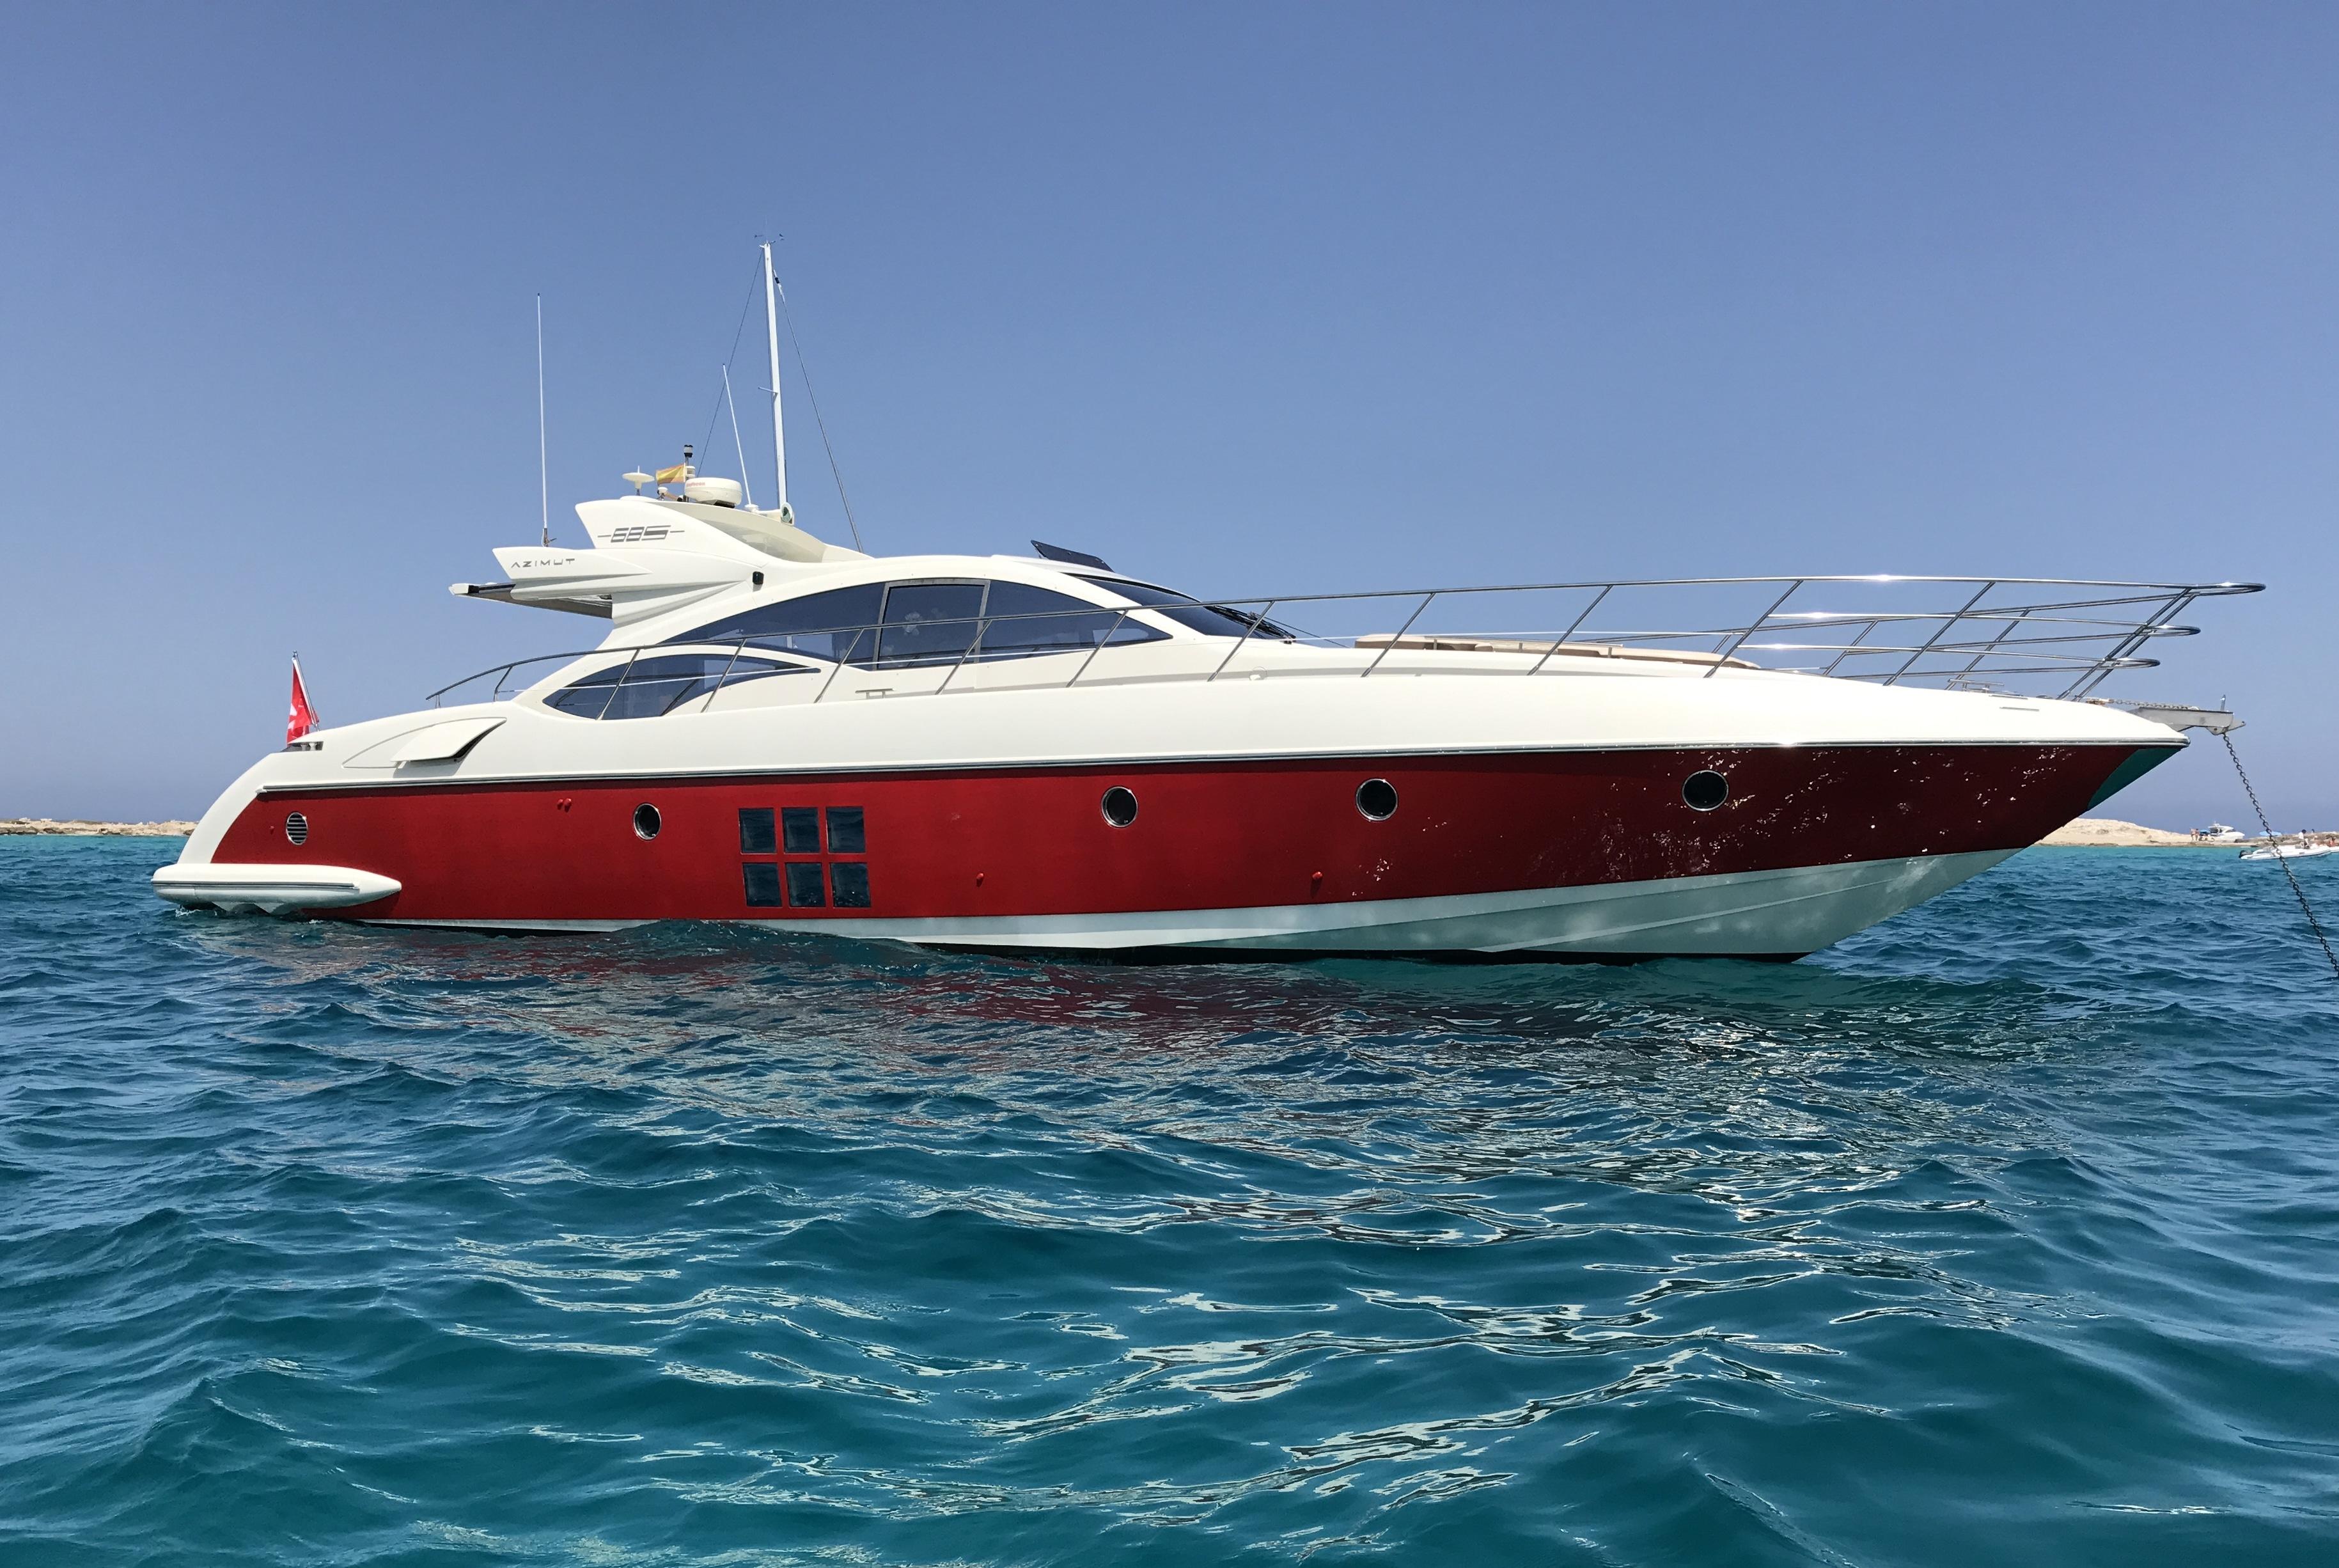 Alquiler de barcos en Ibiza Azimut 68s